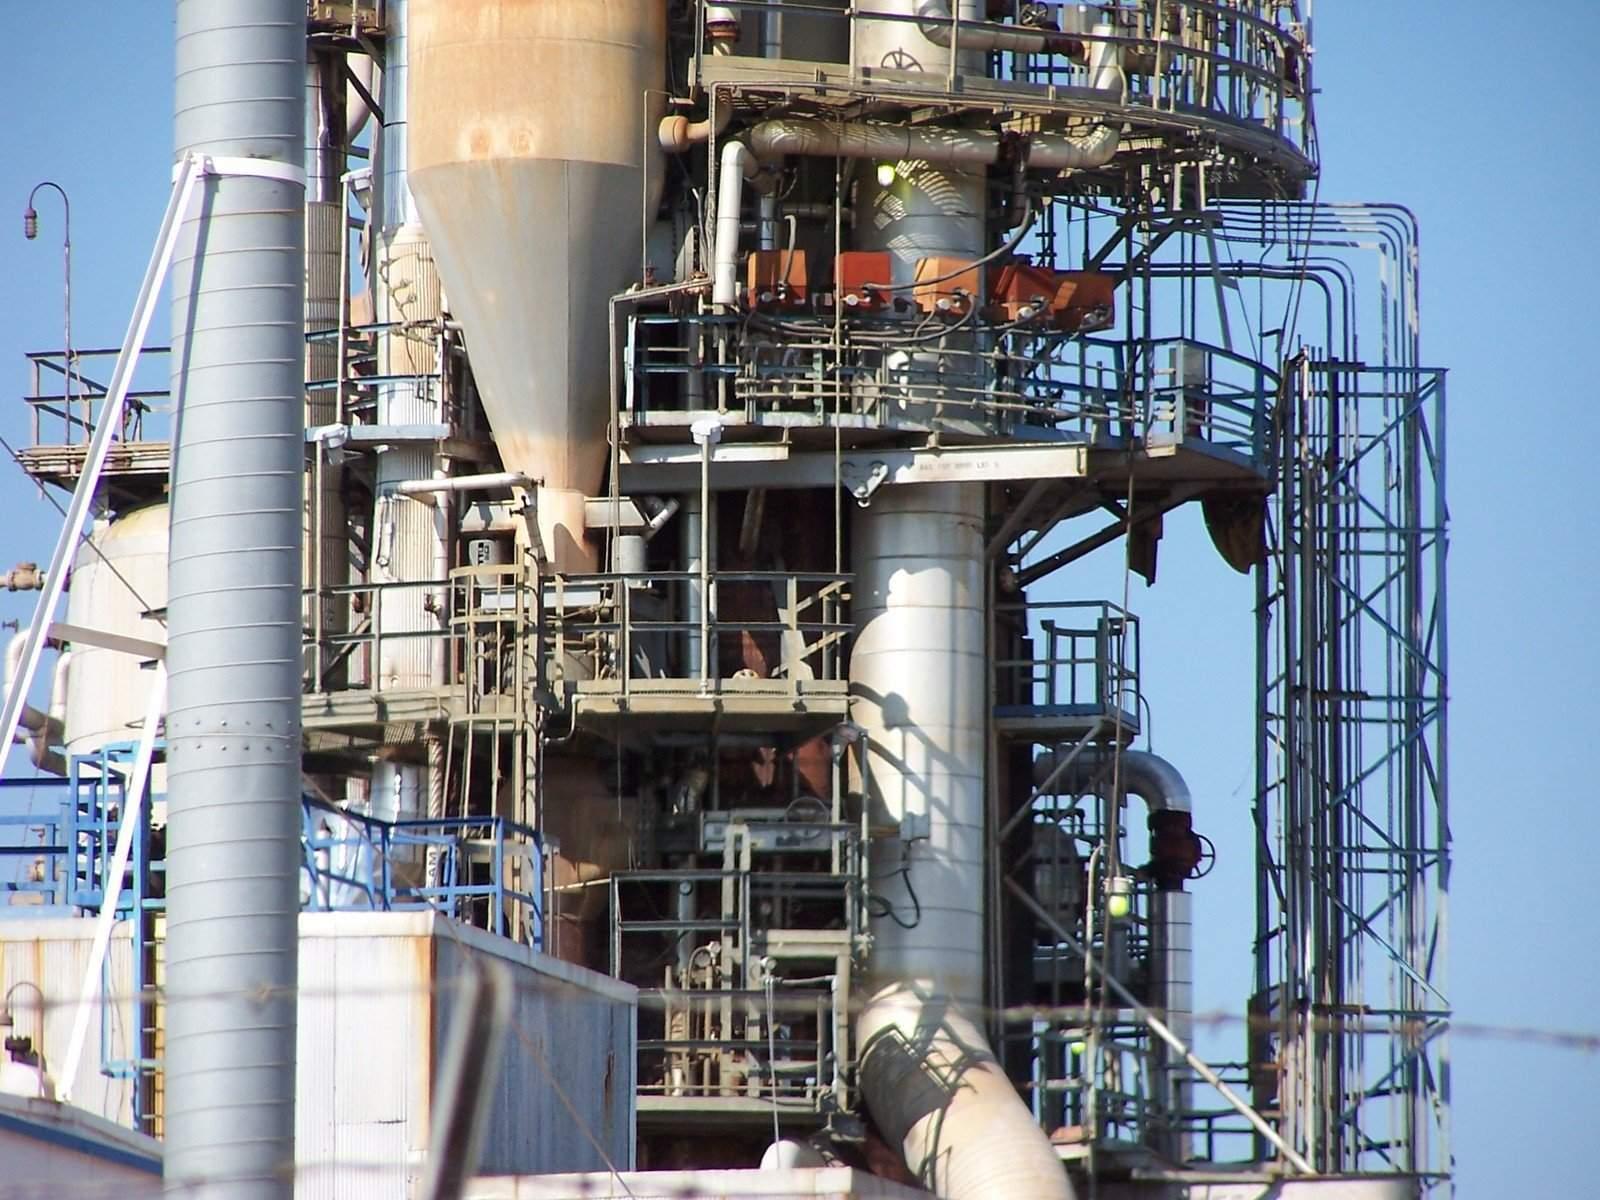 refinery-row-2-1545671